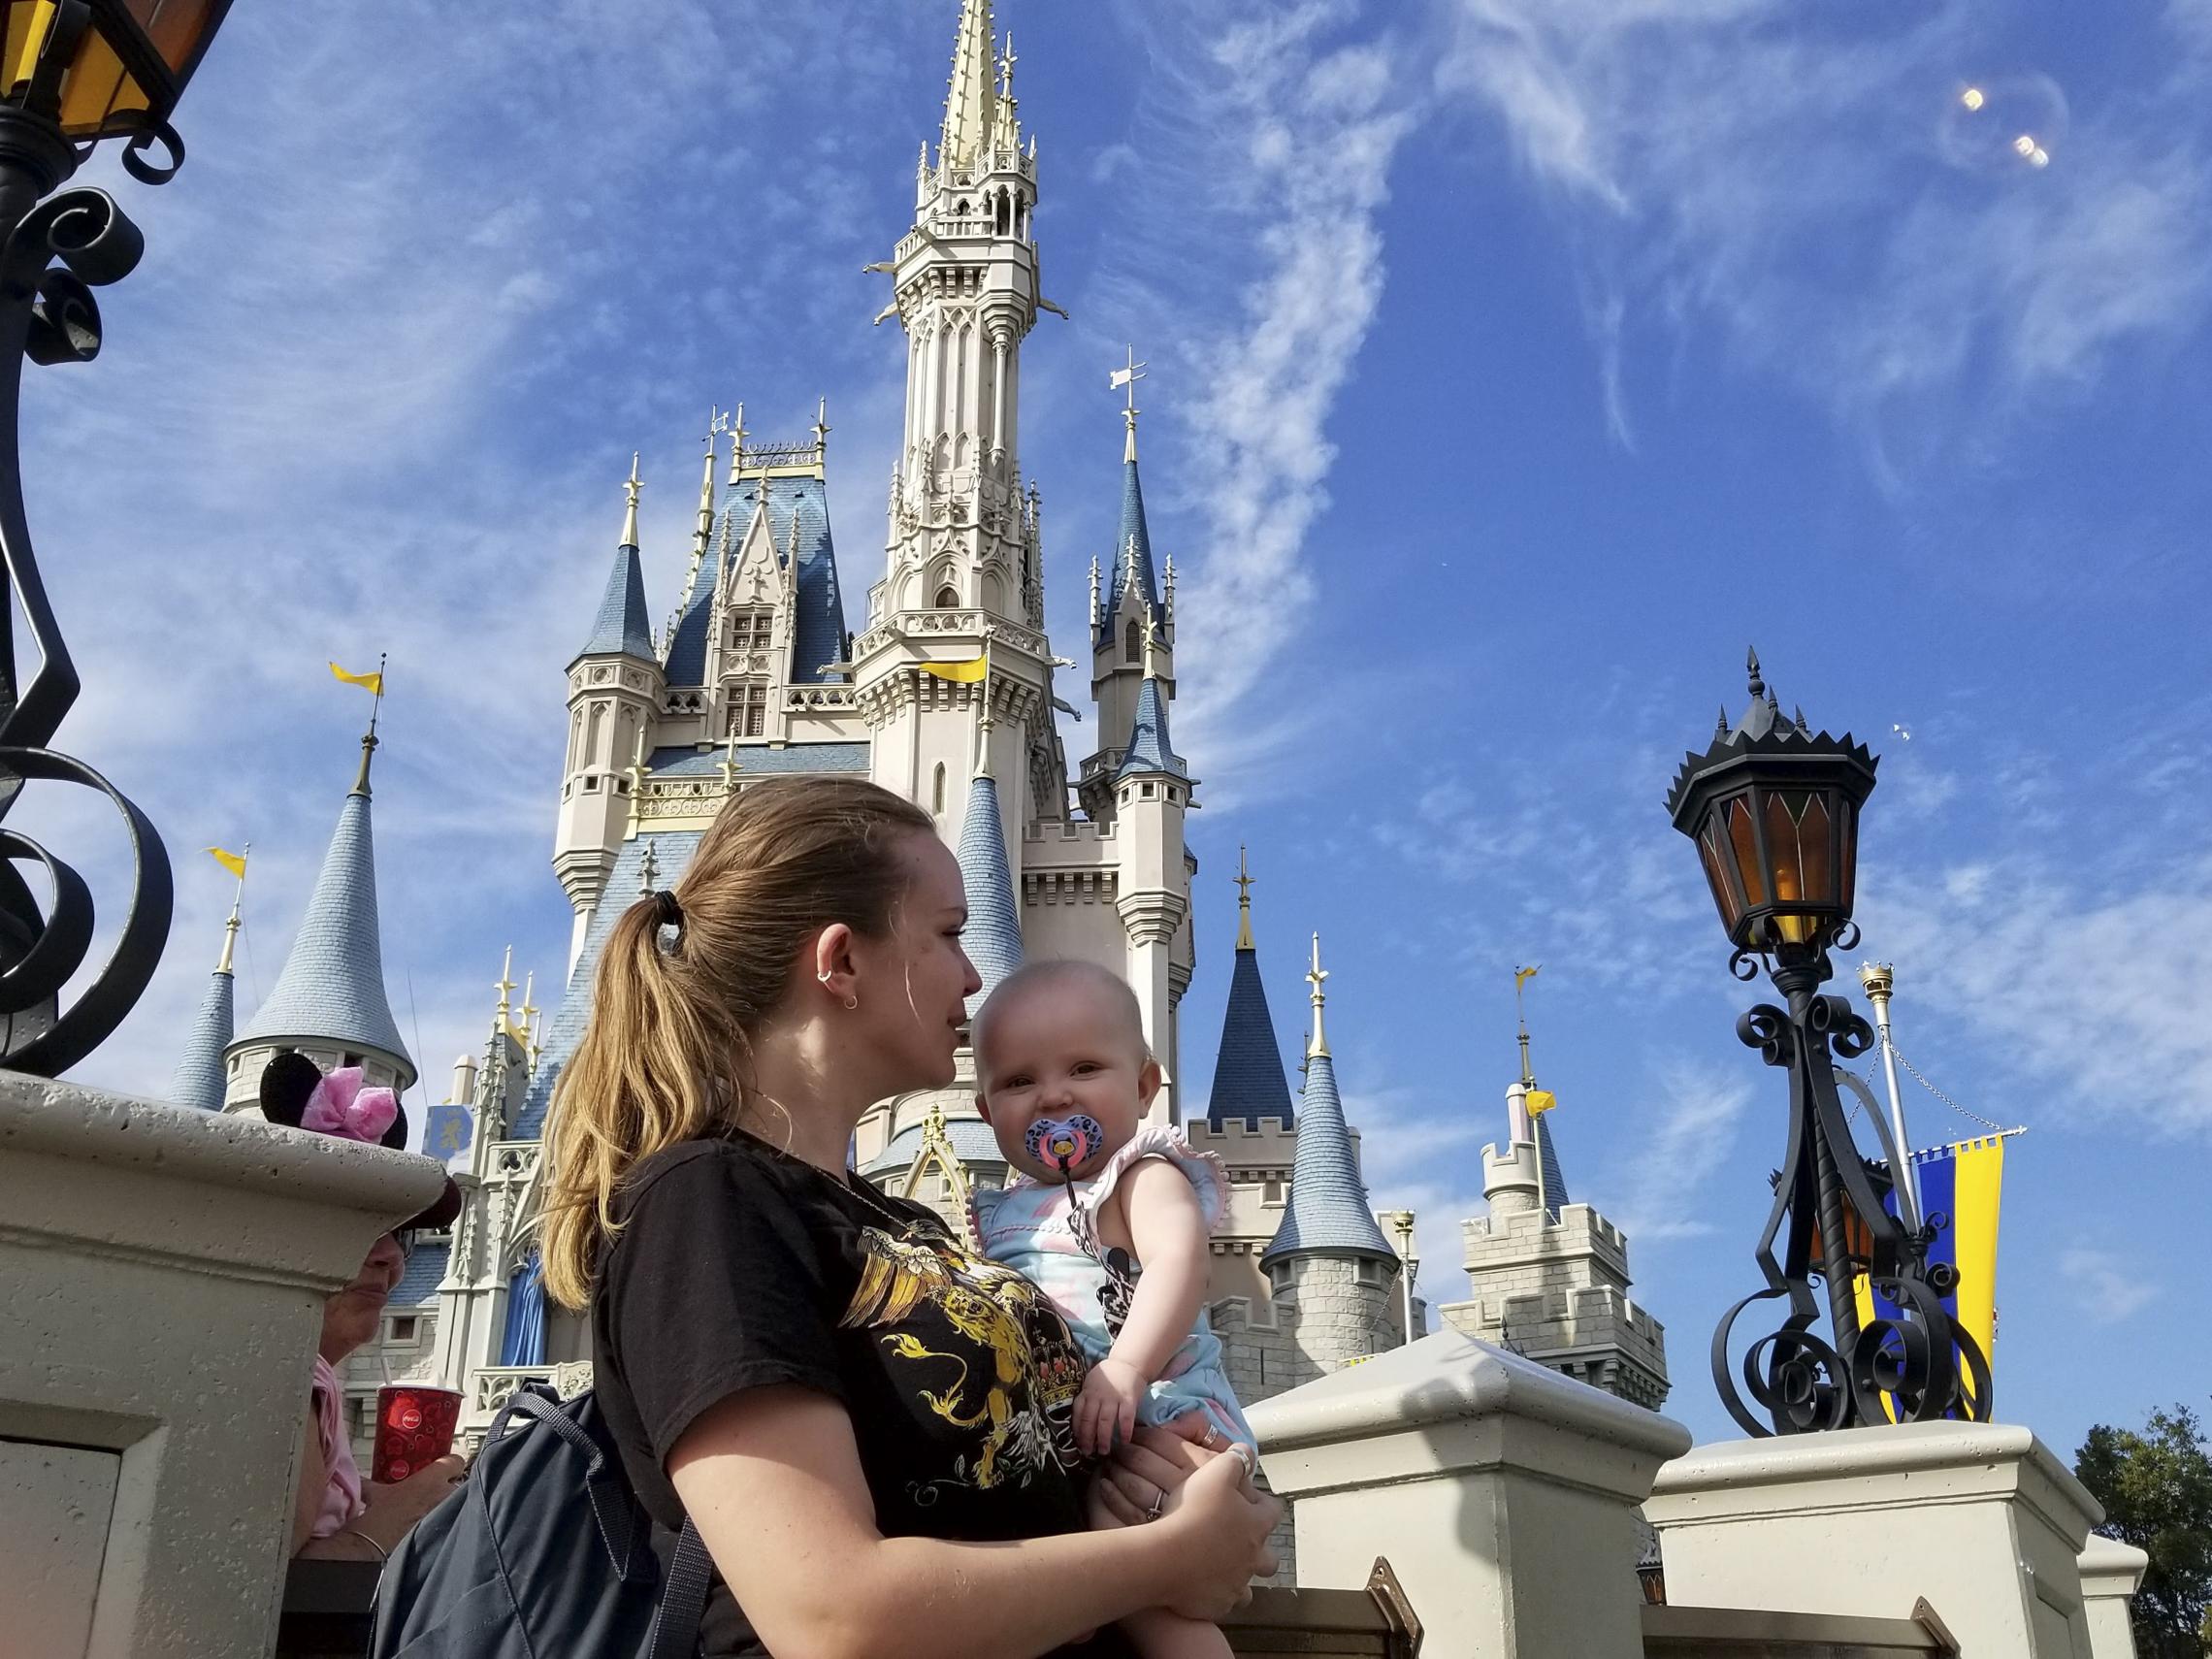 NWT Walt Disney World Florida Adventure Attraction Passport Adult Dress Socks